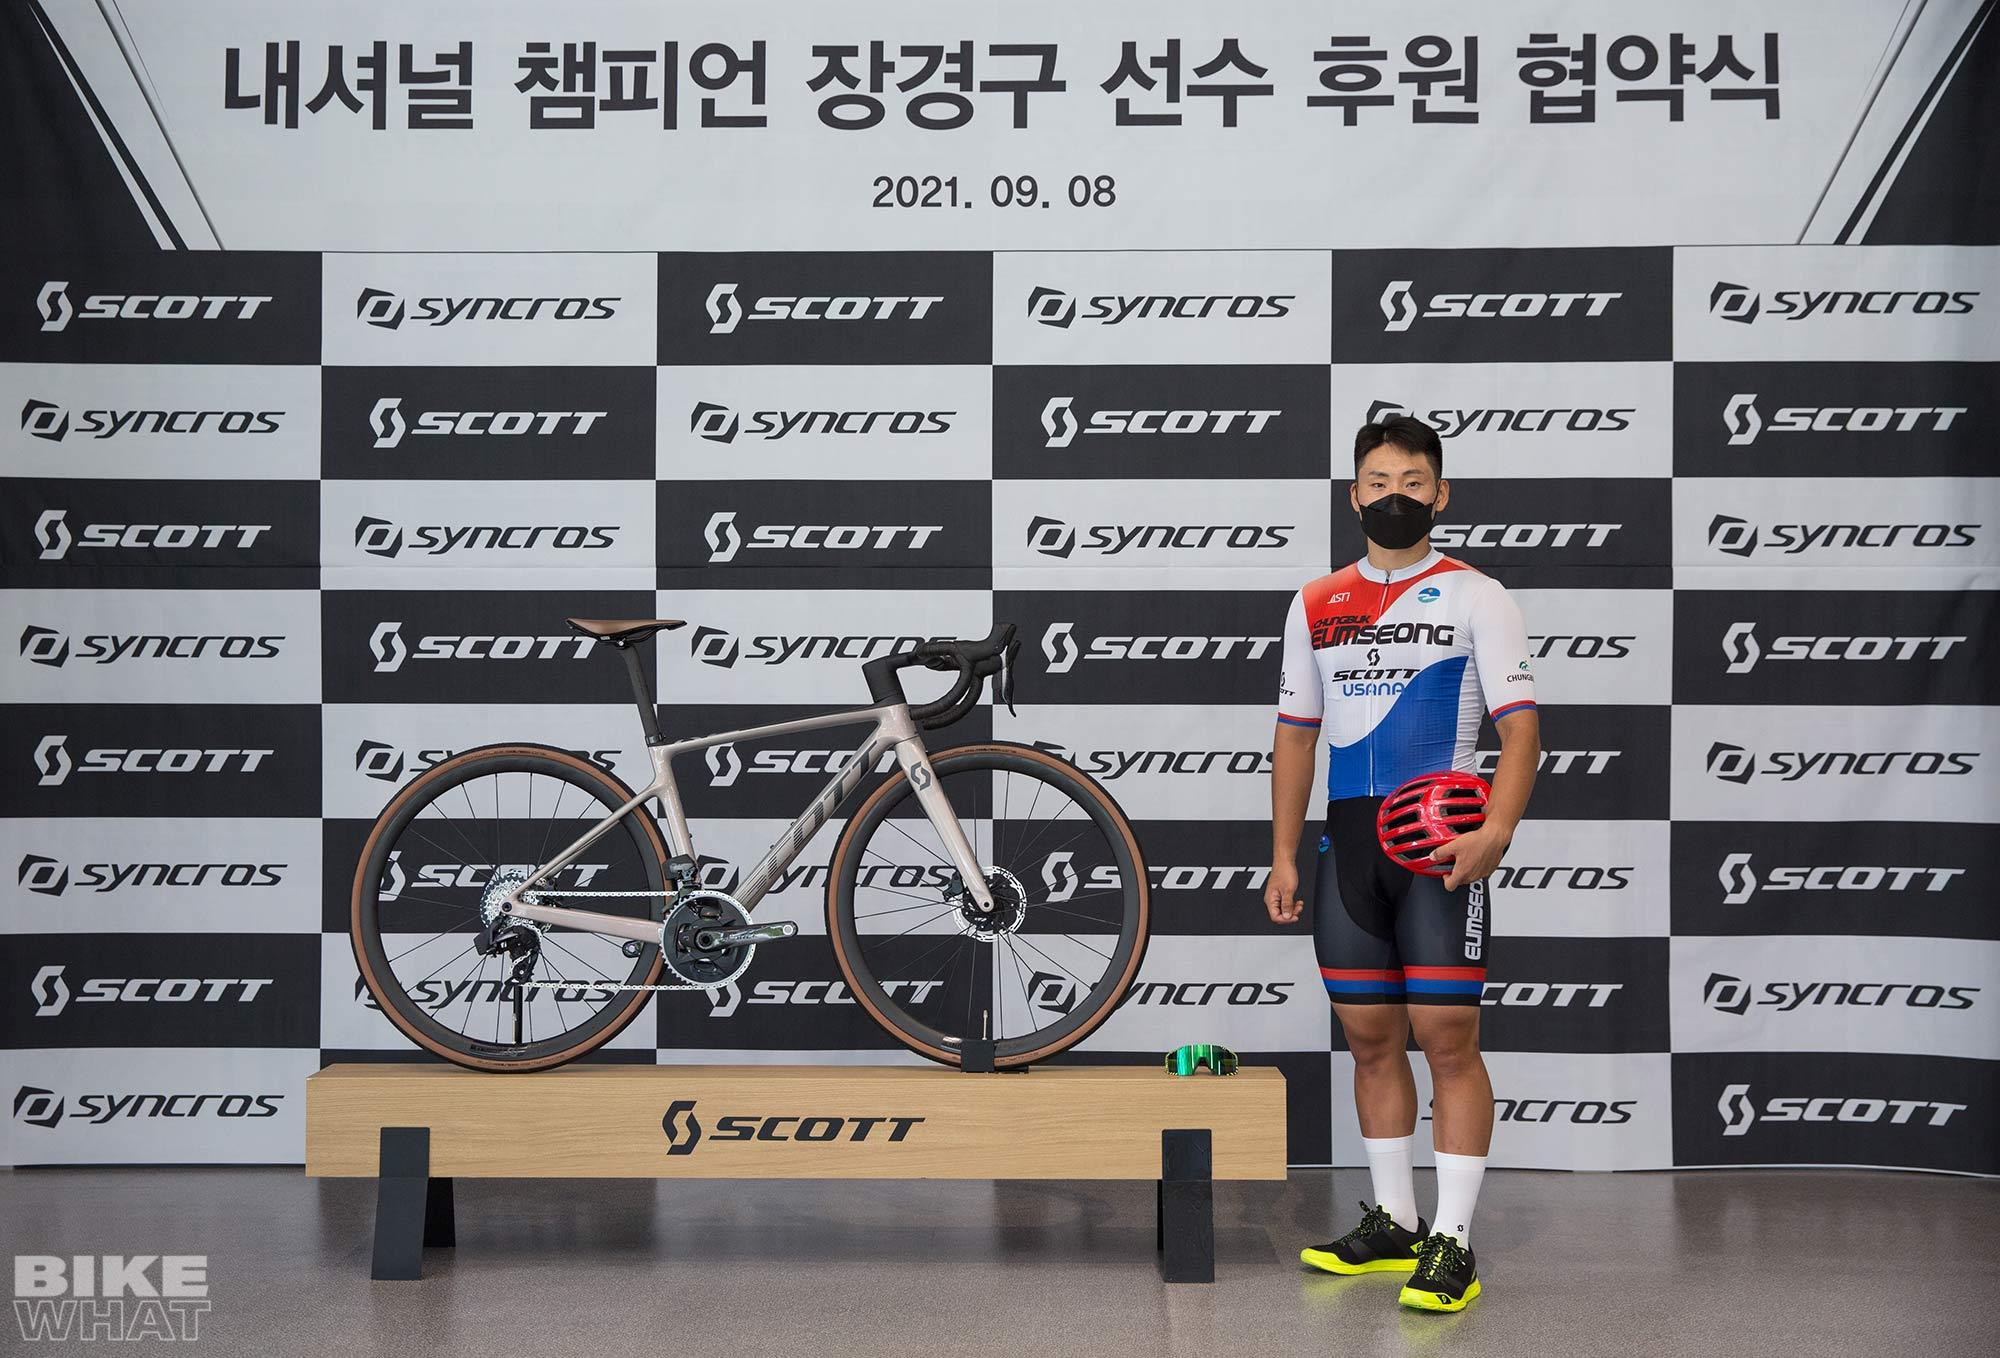 news_scott-north-asia-support-2021-korea-national-champion_1